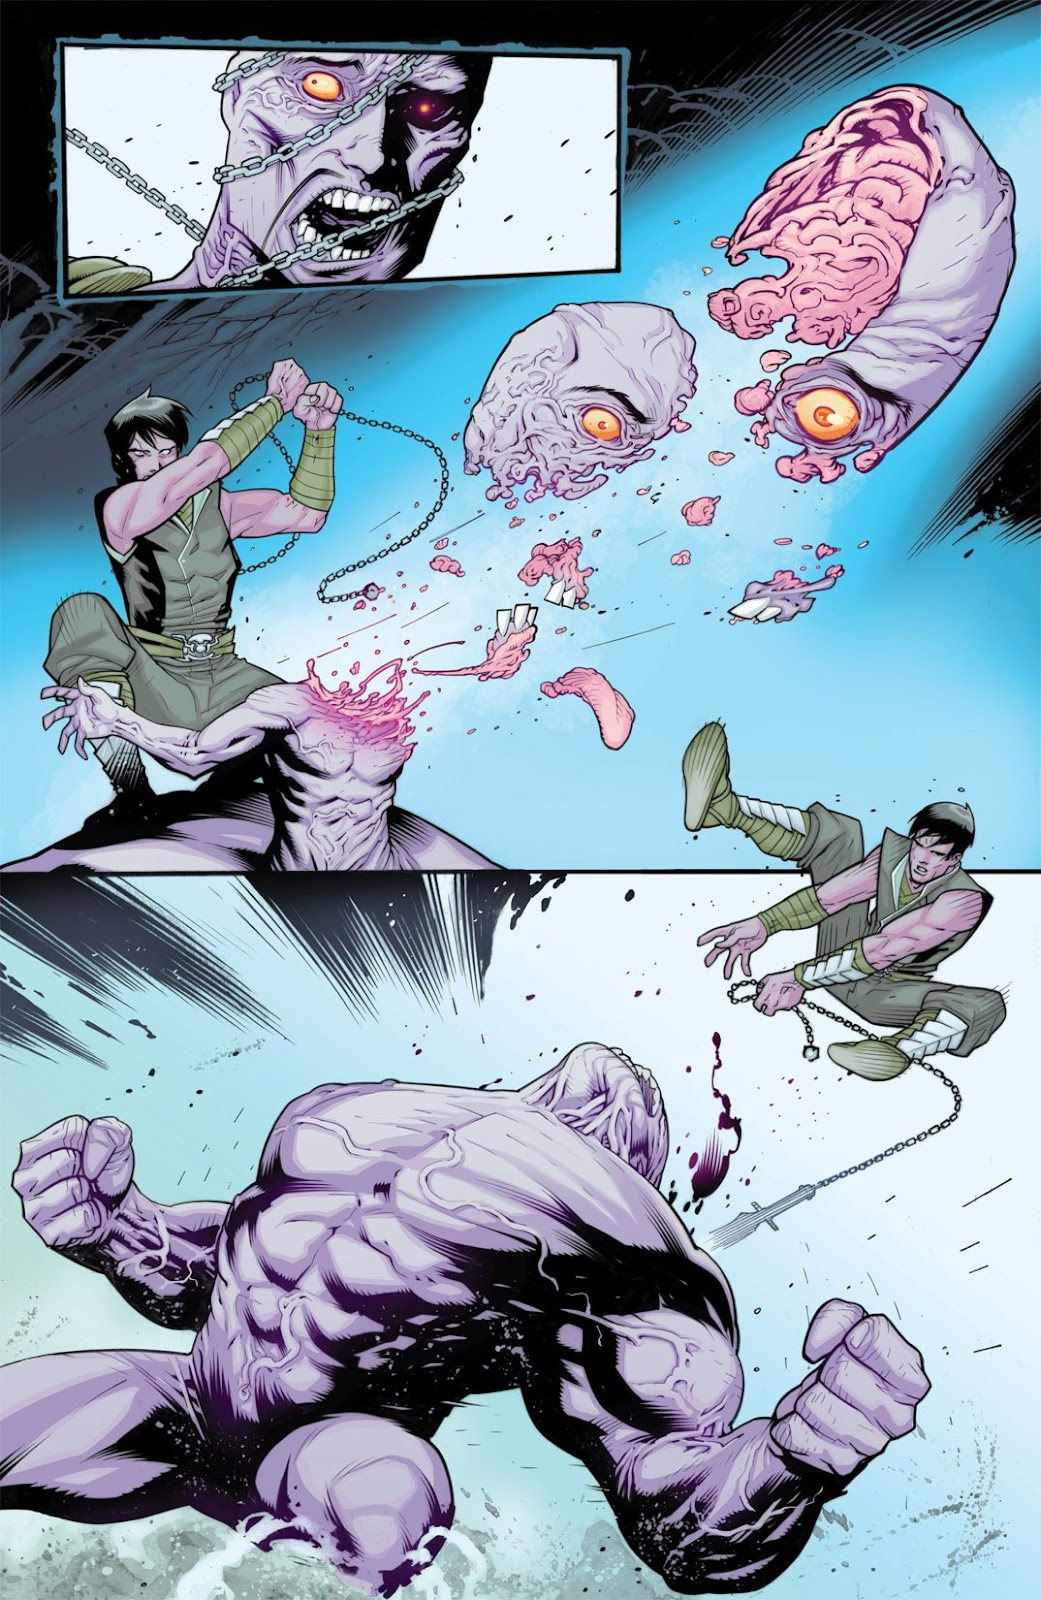 Read online Reaper comic -  Issue #2 - 40